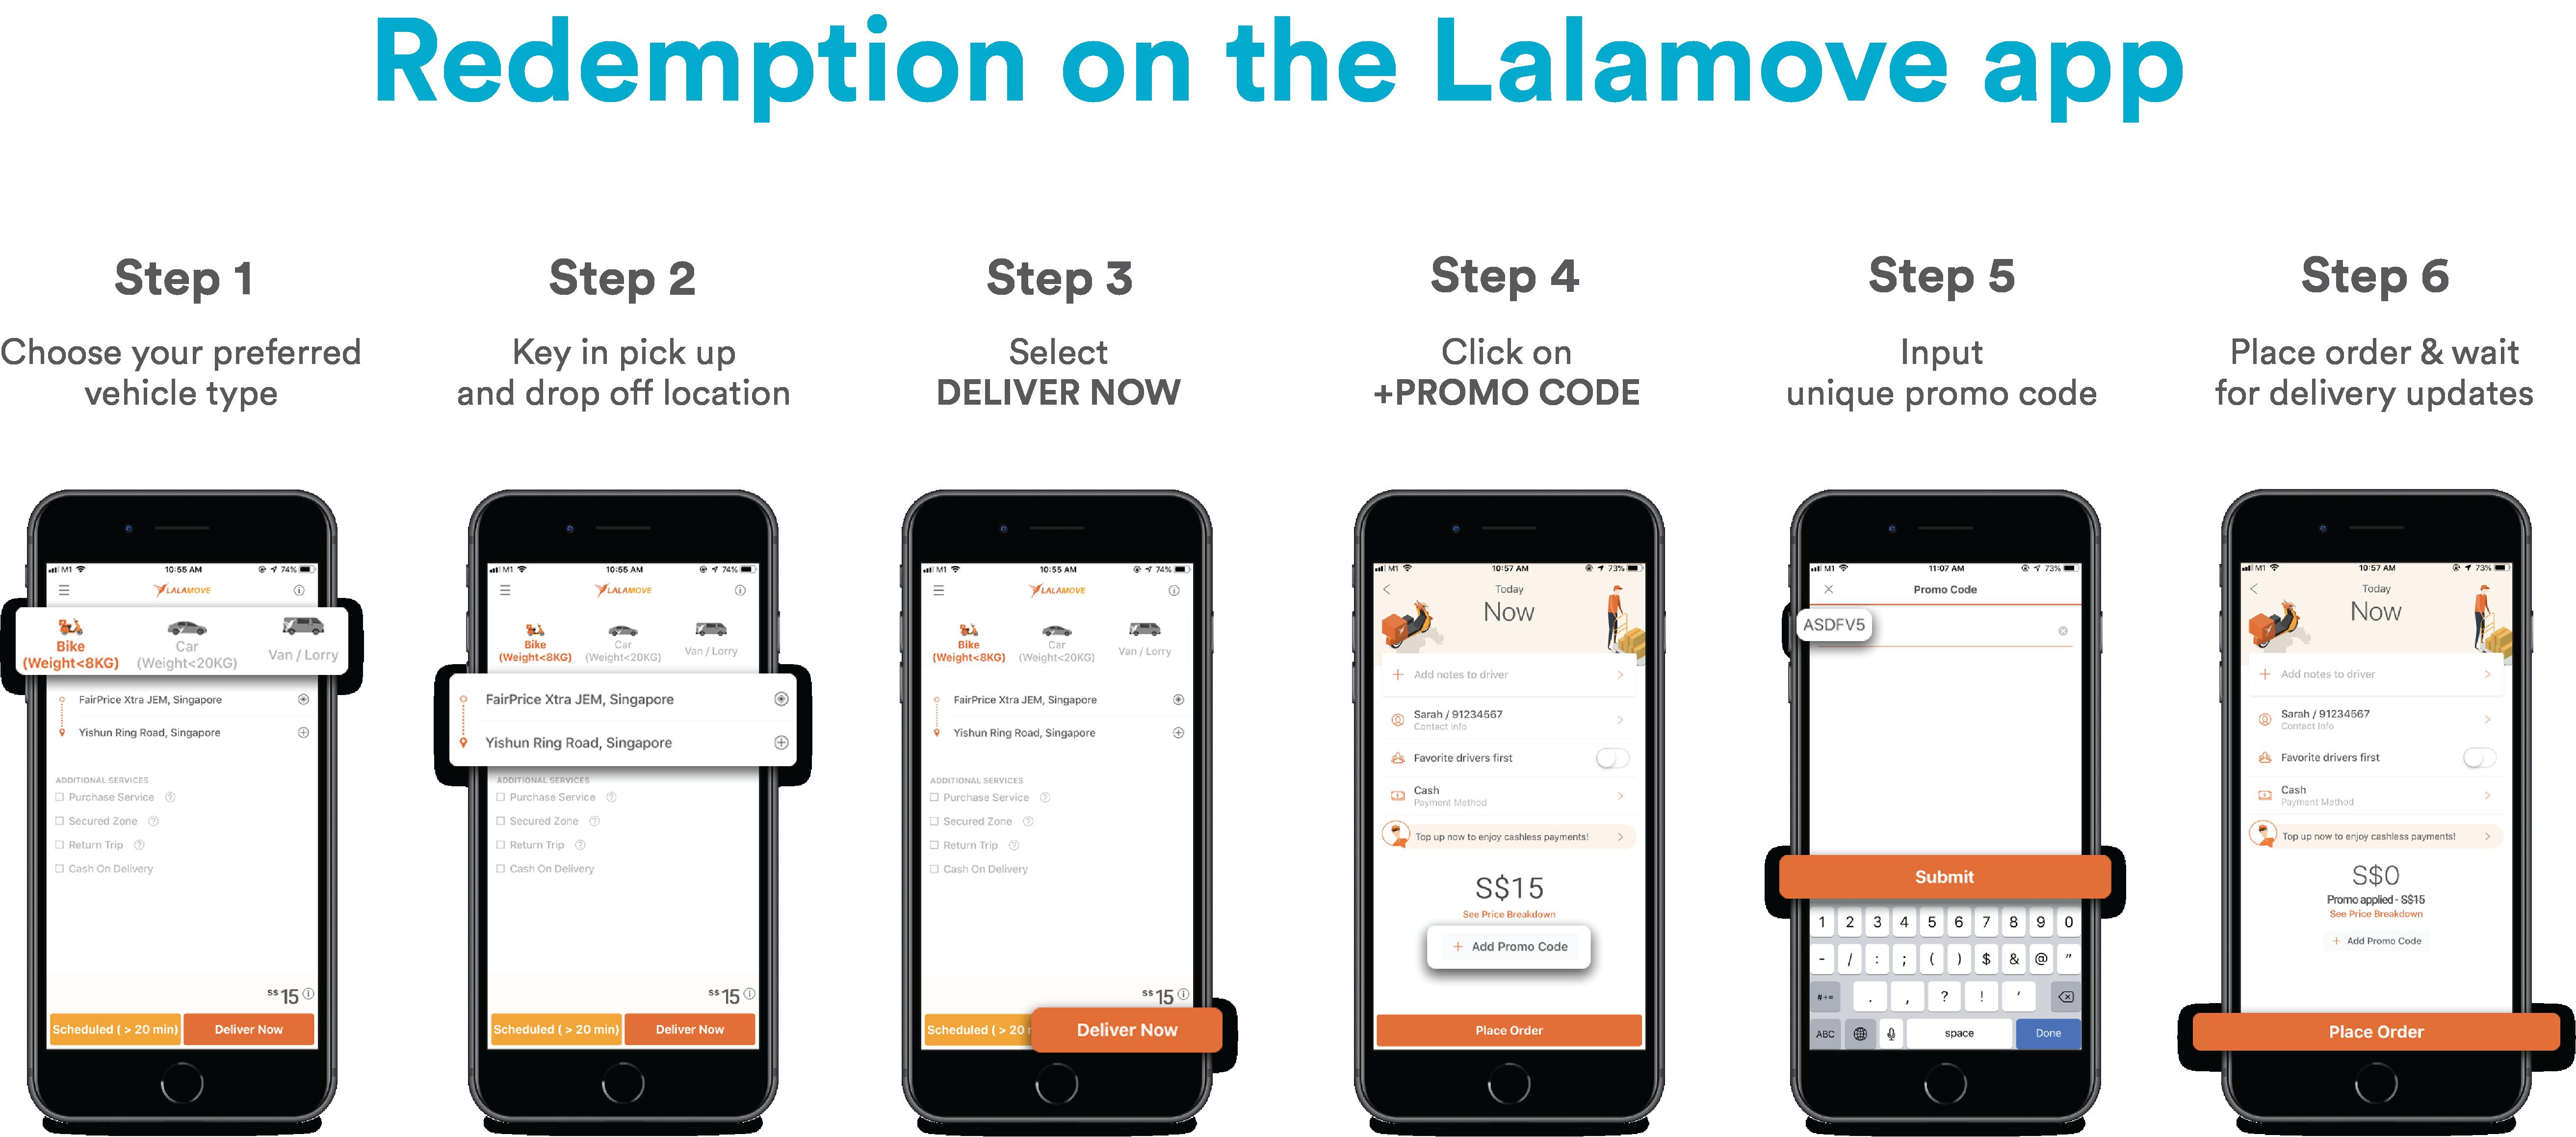 lalamove app redemption